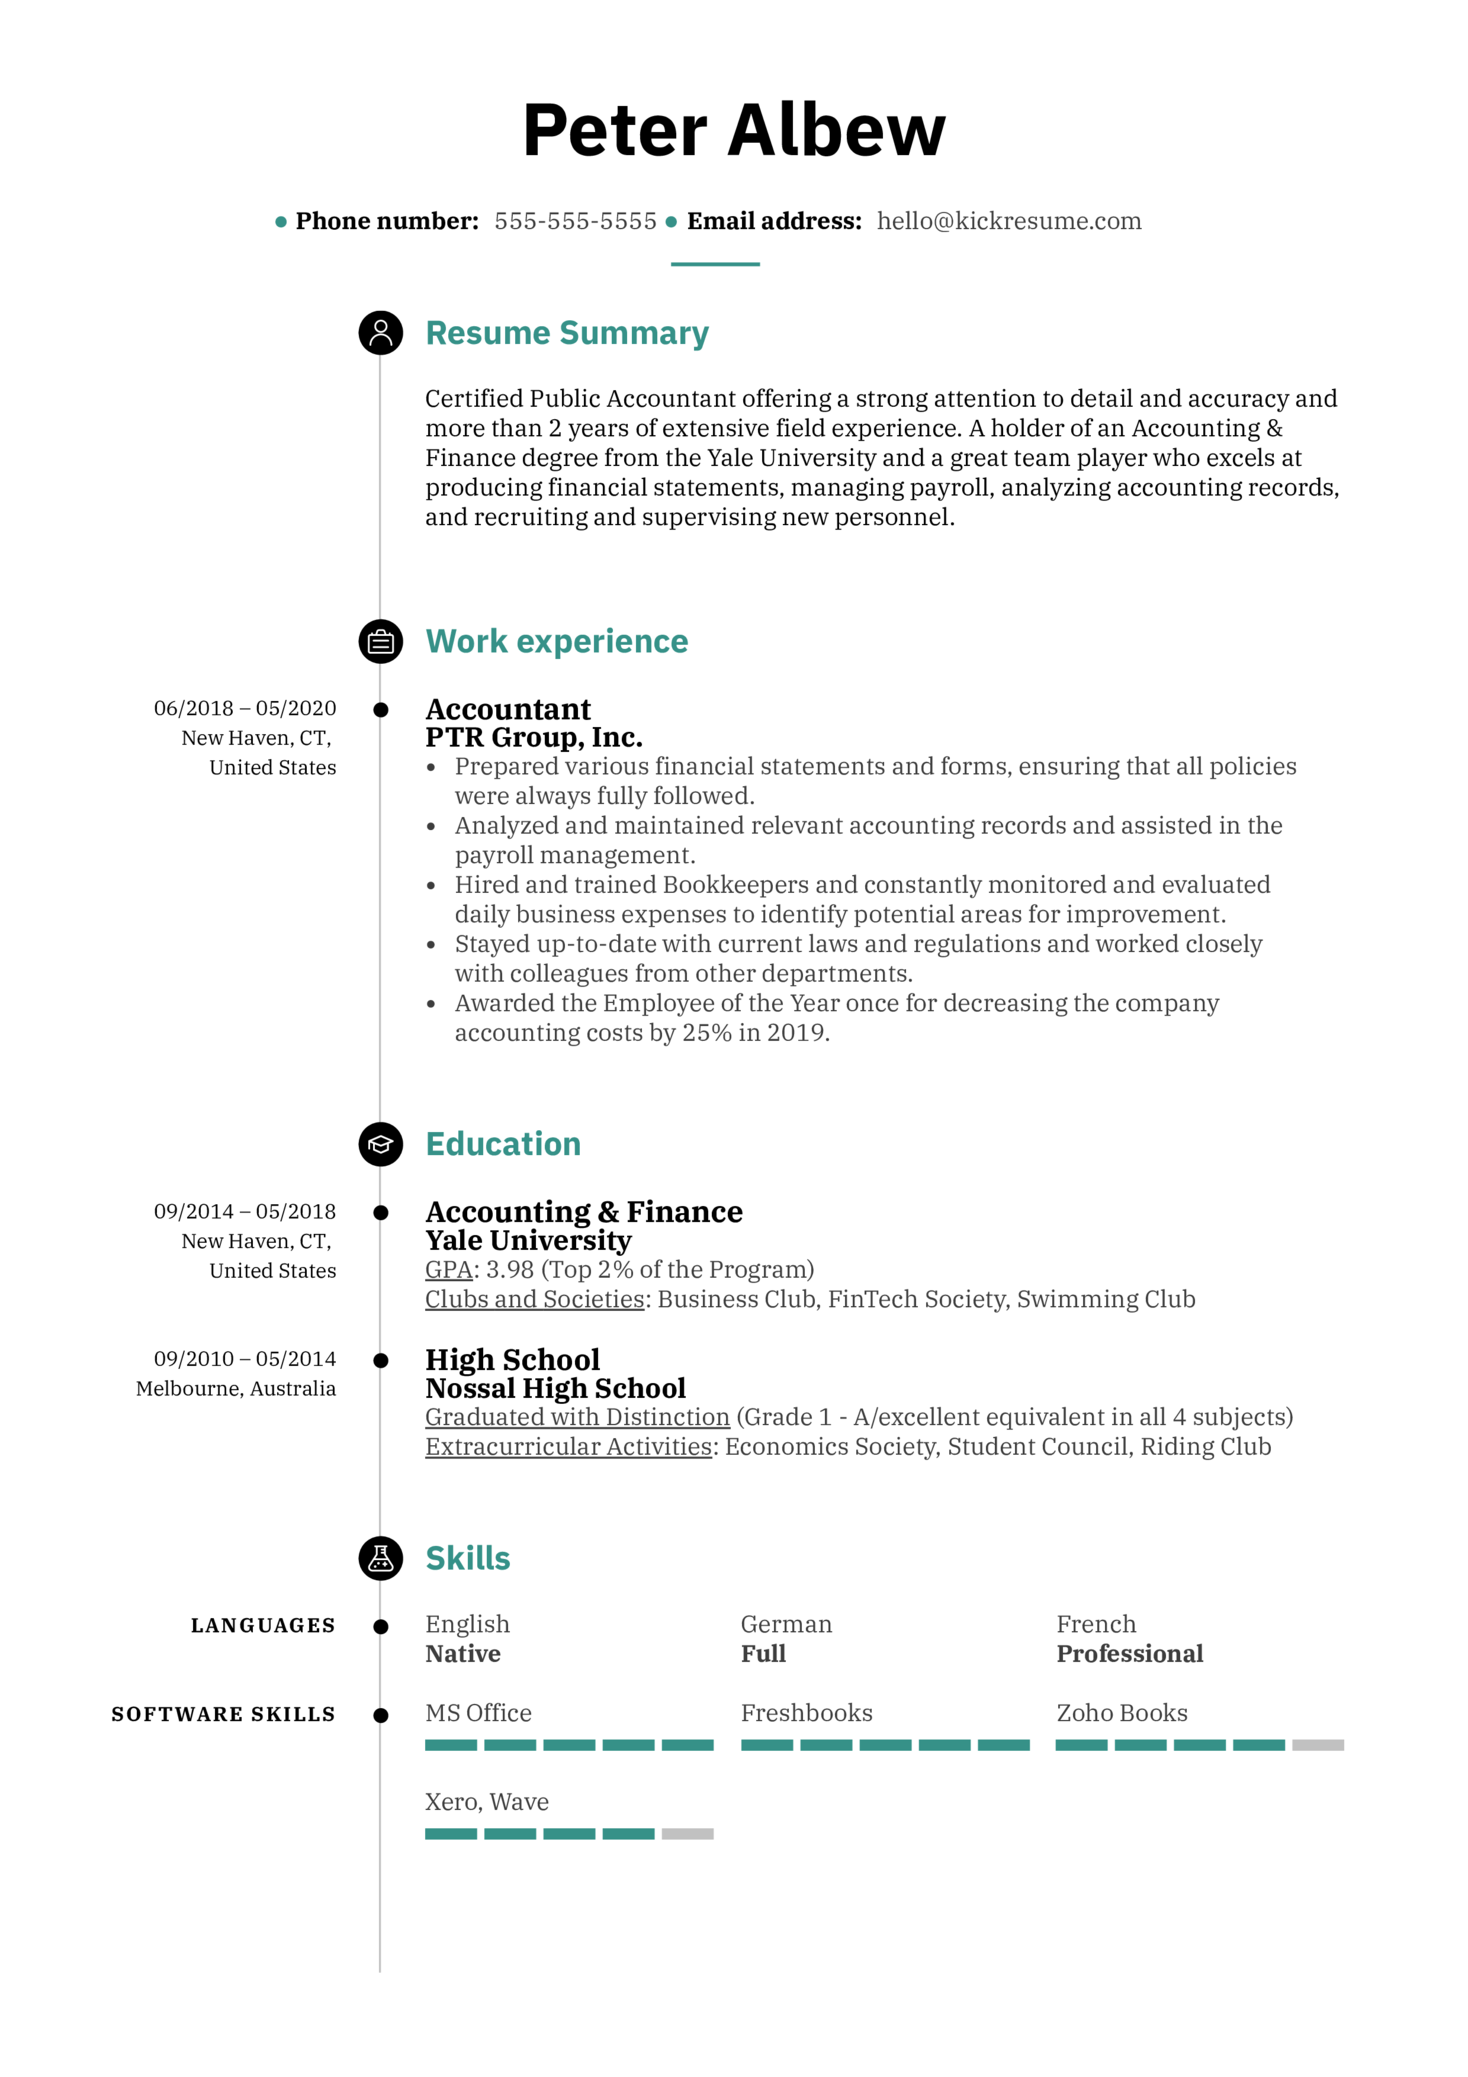 Resume Summary Example (Part 1)